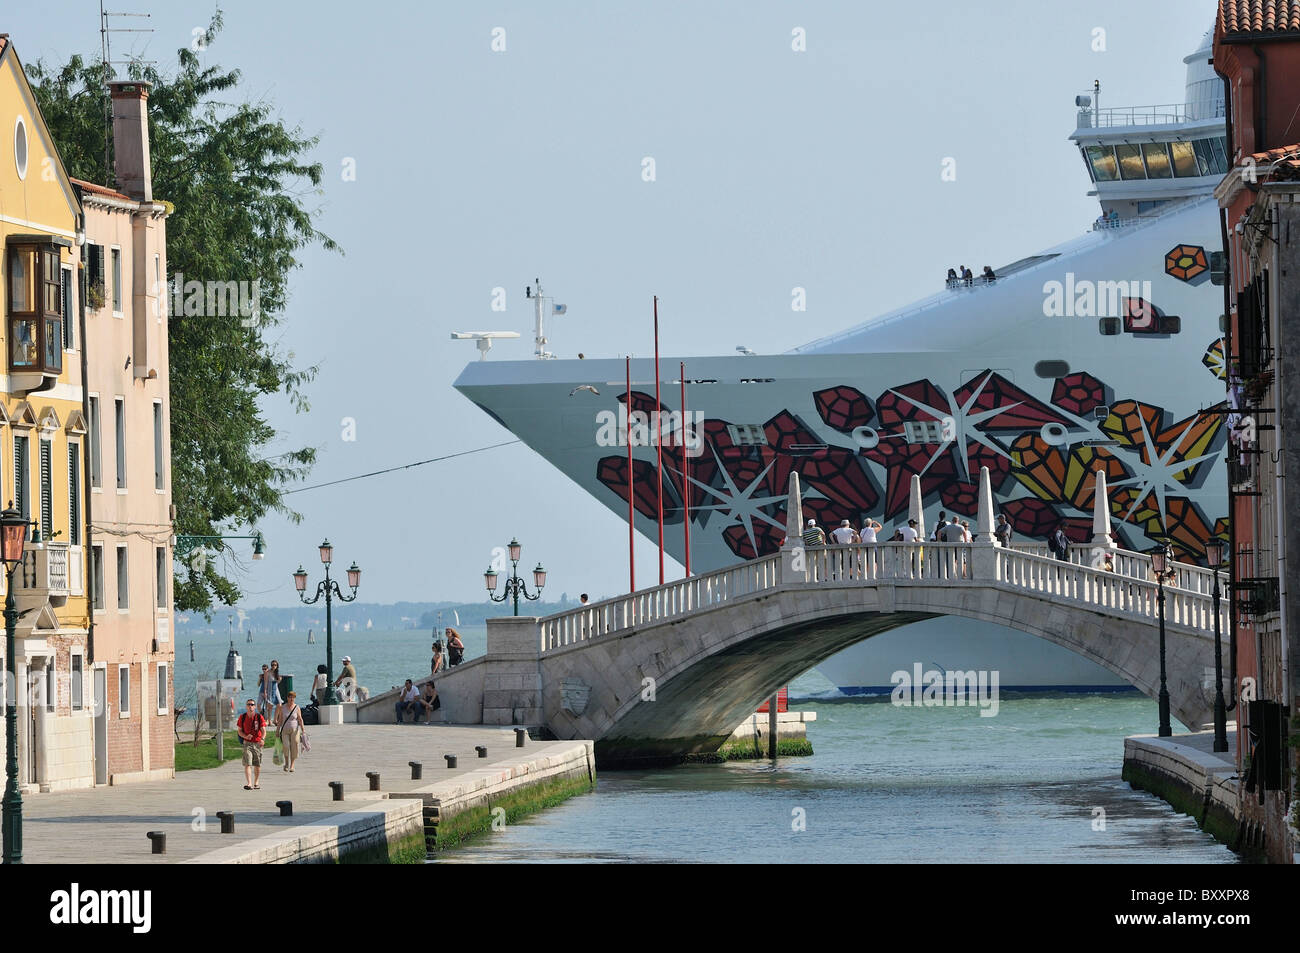 Venice. Italy. A Cruise ship passes through the Canale della Giudecca. - Stock Image